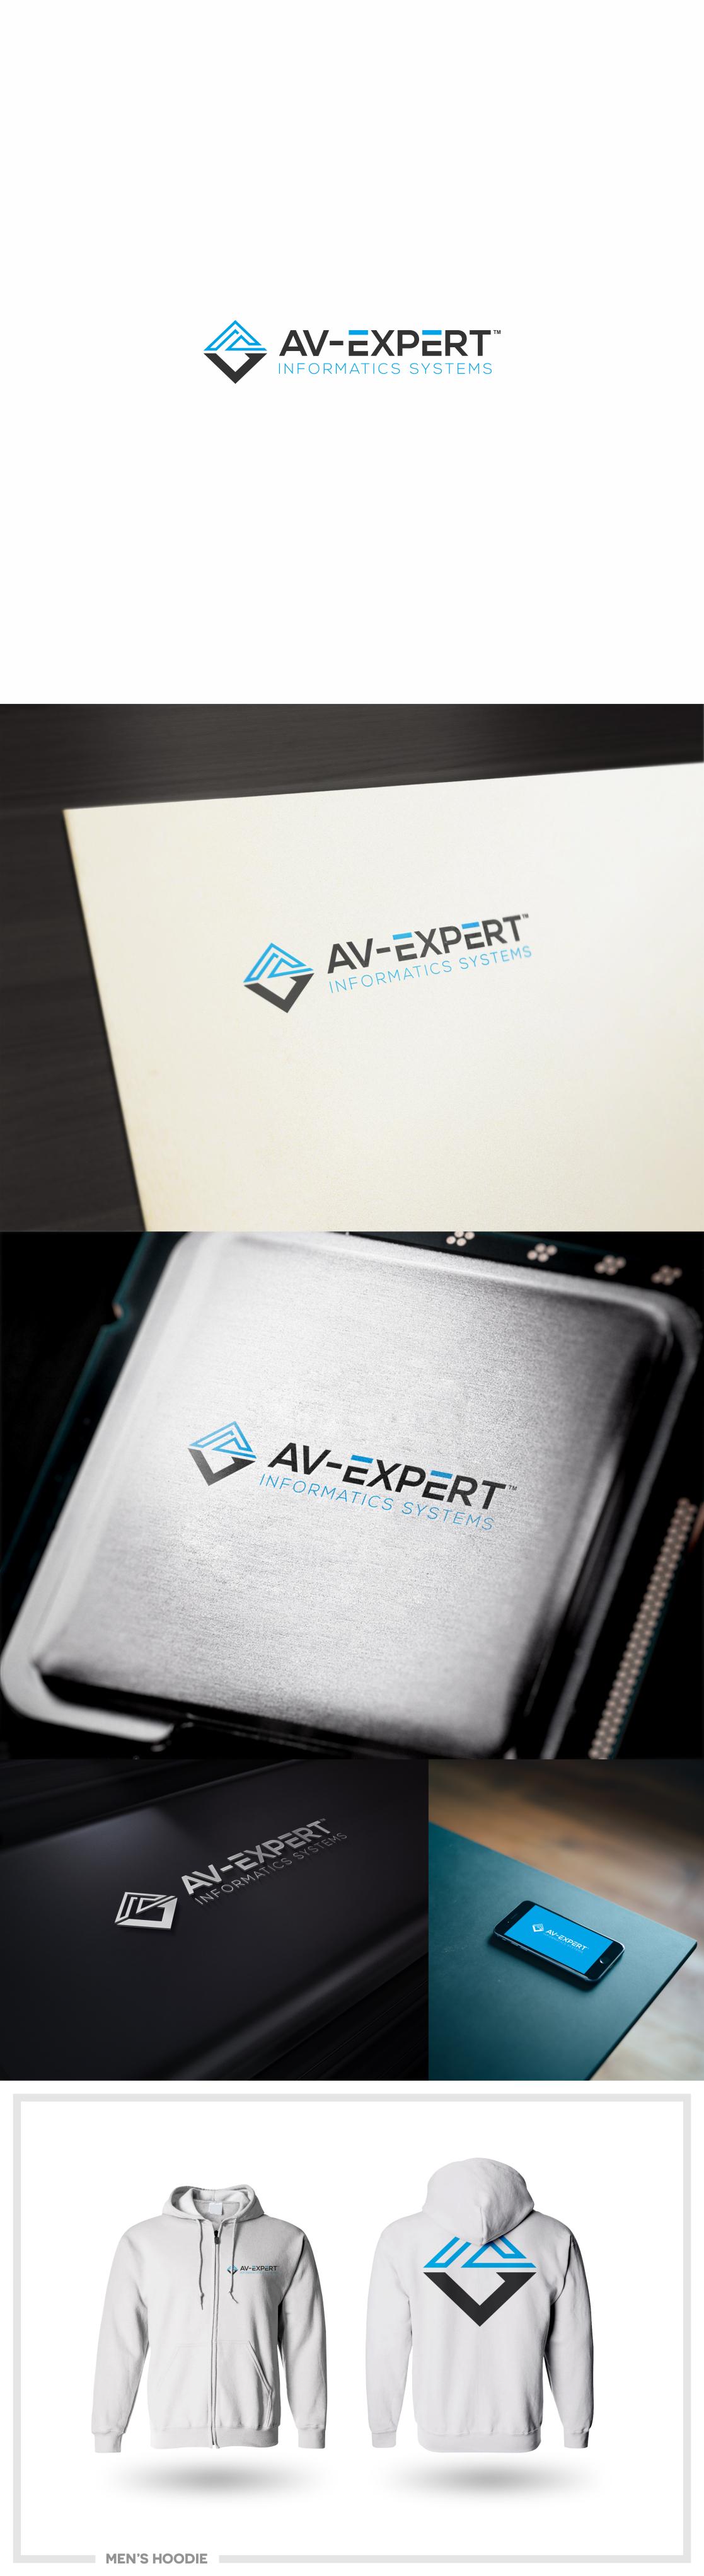 Создание логотипа, фирстиля фото f_2555c644db478a41.jpg